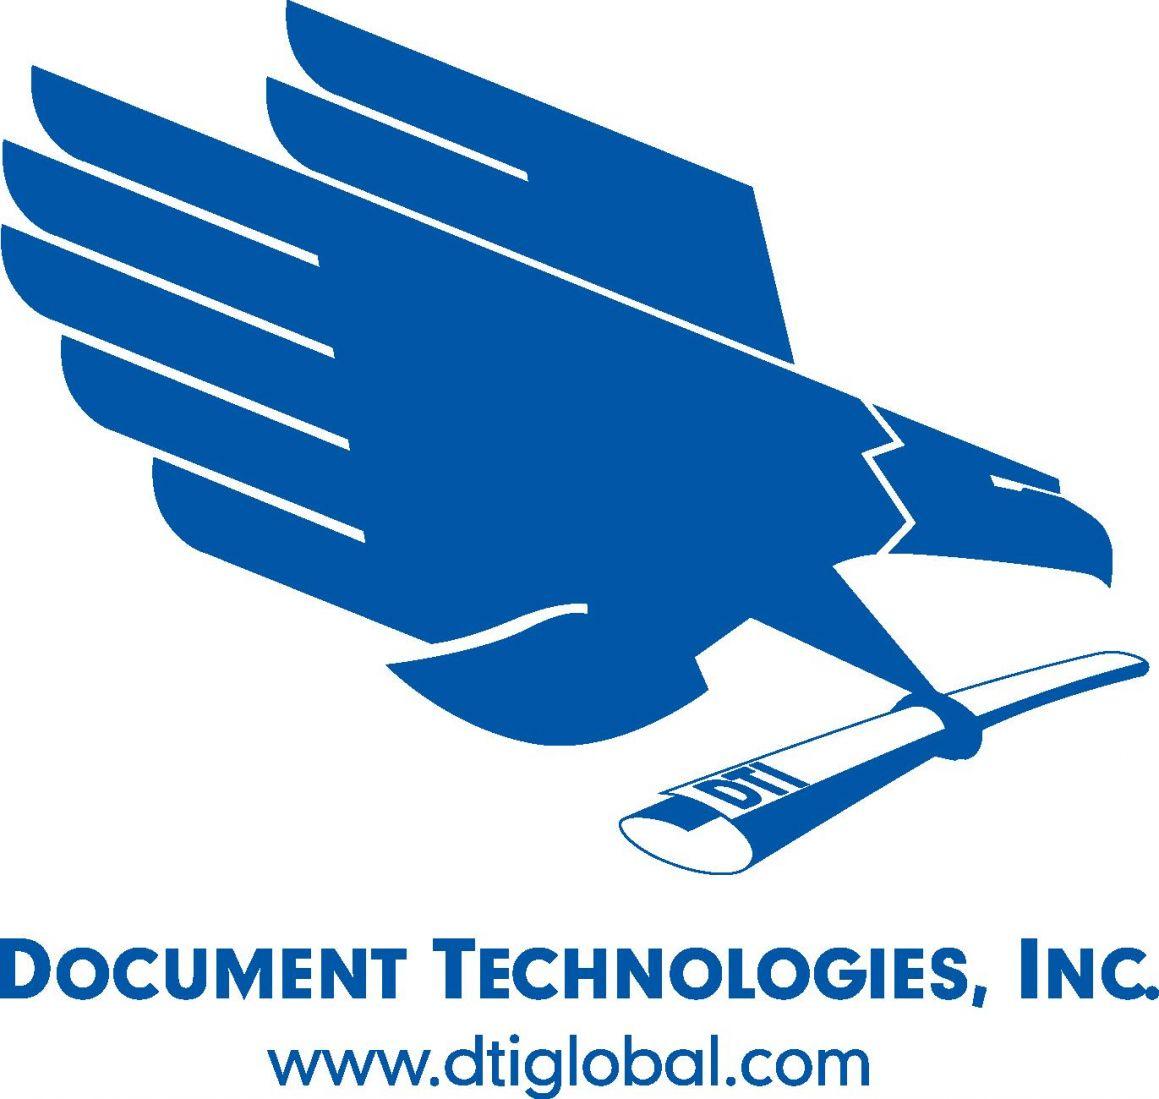 Document Technologies, Inc.